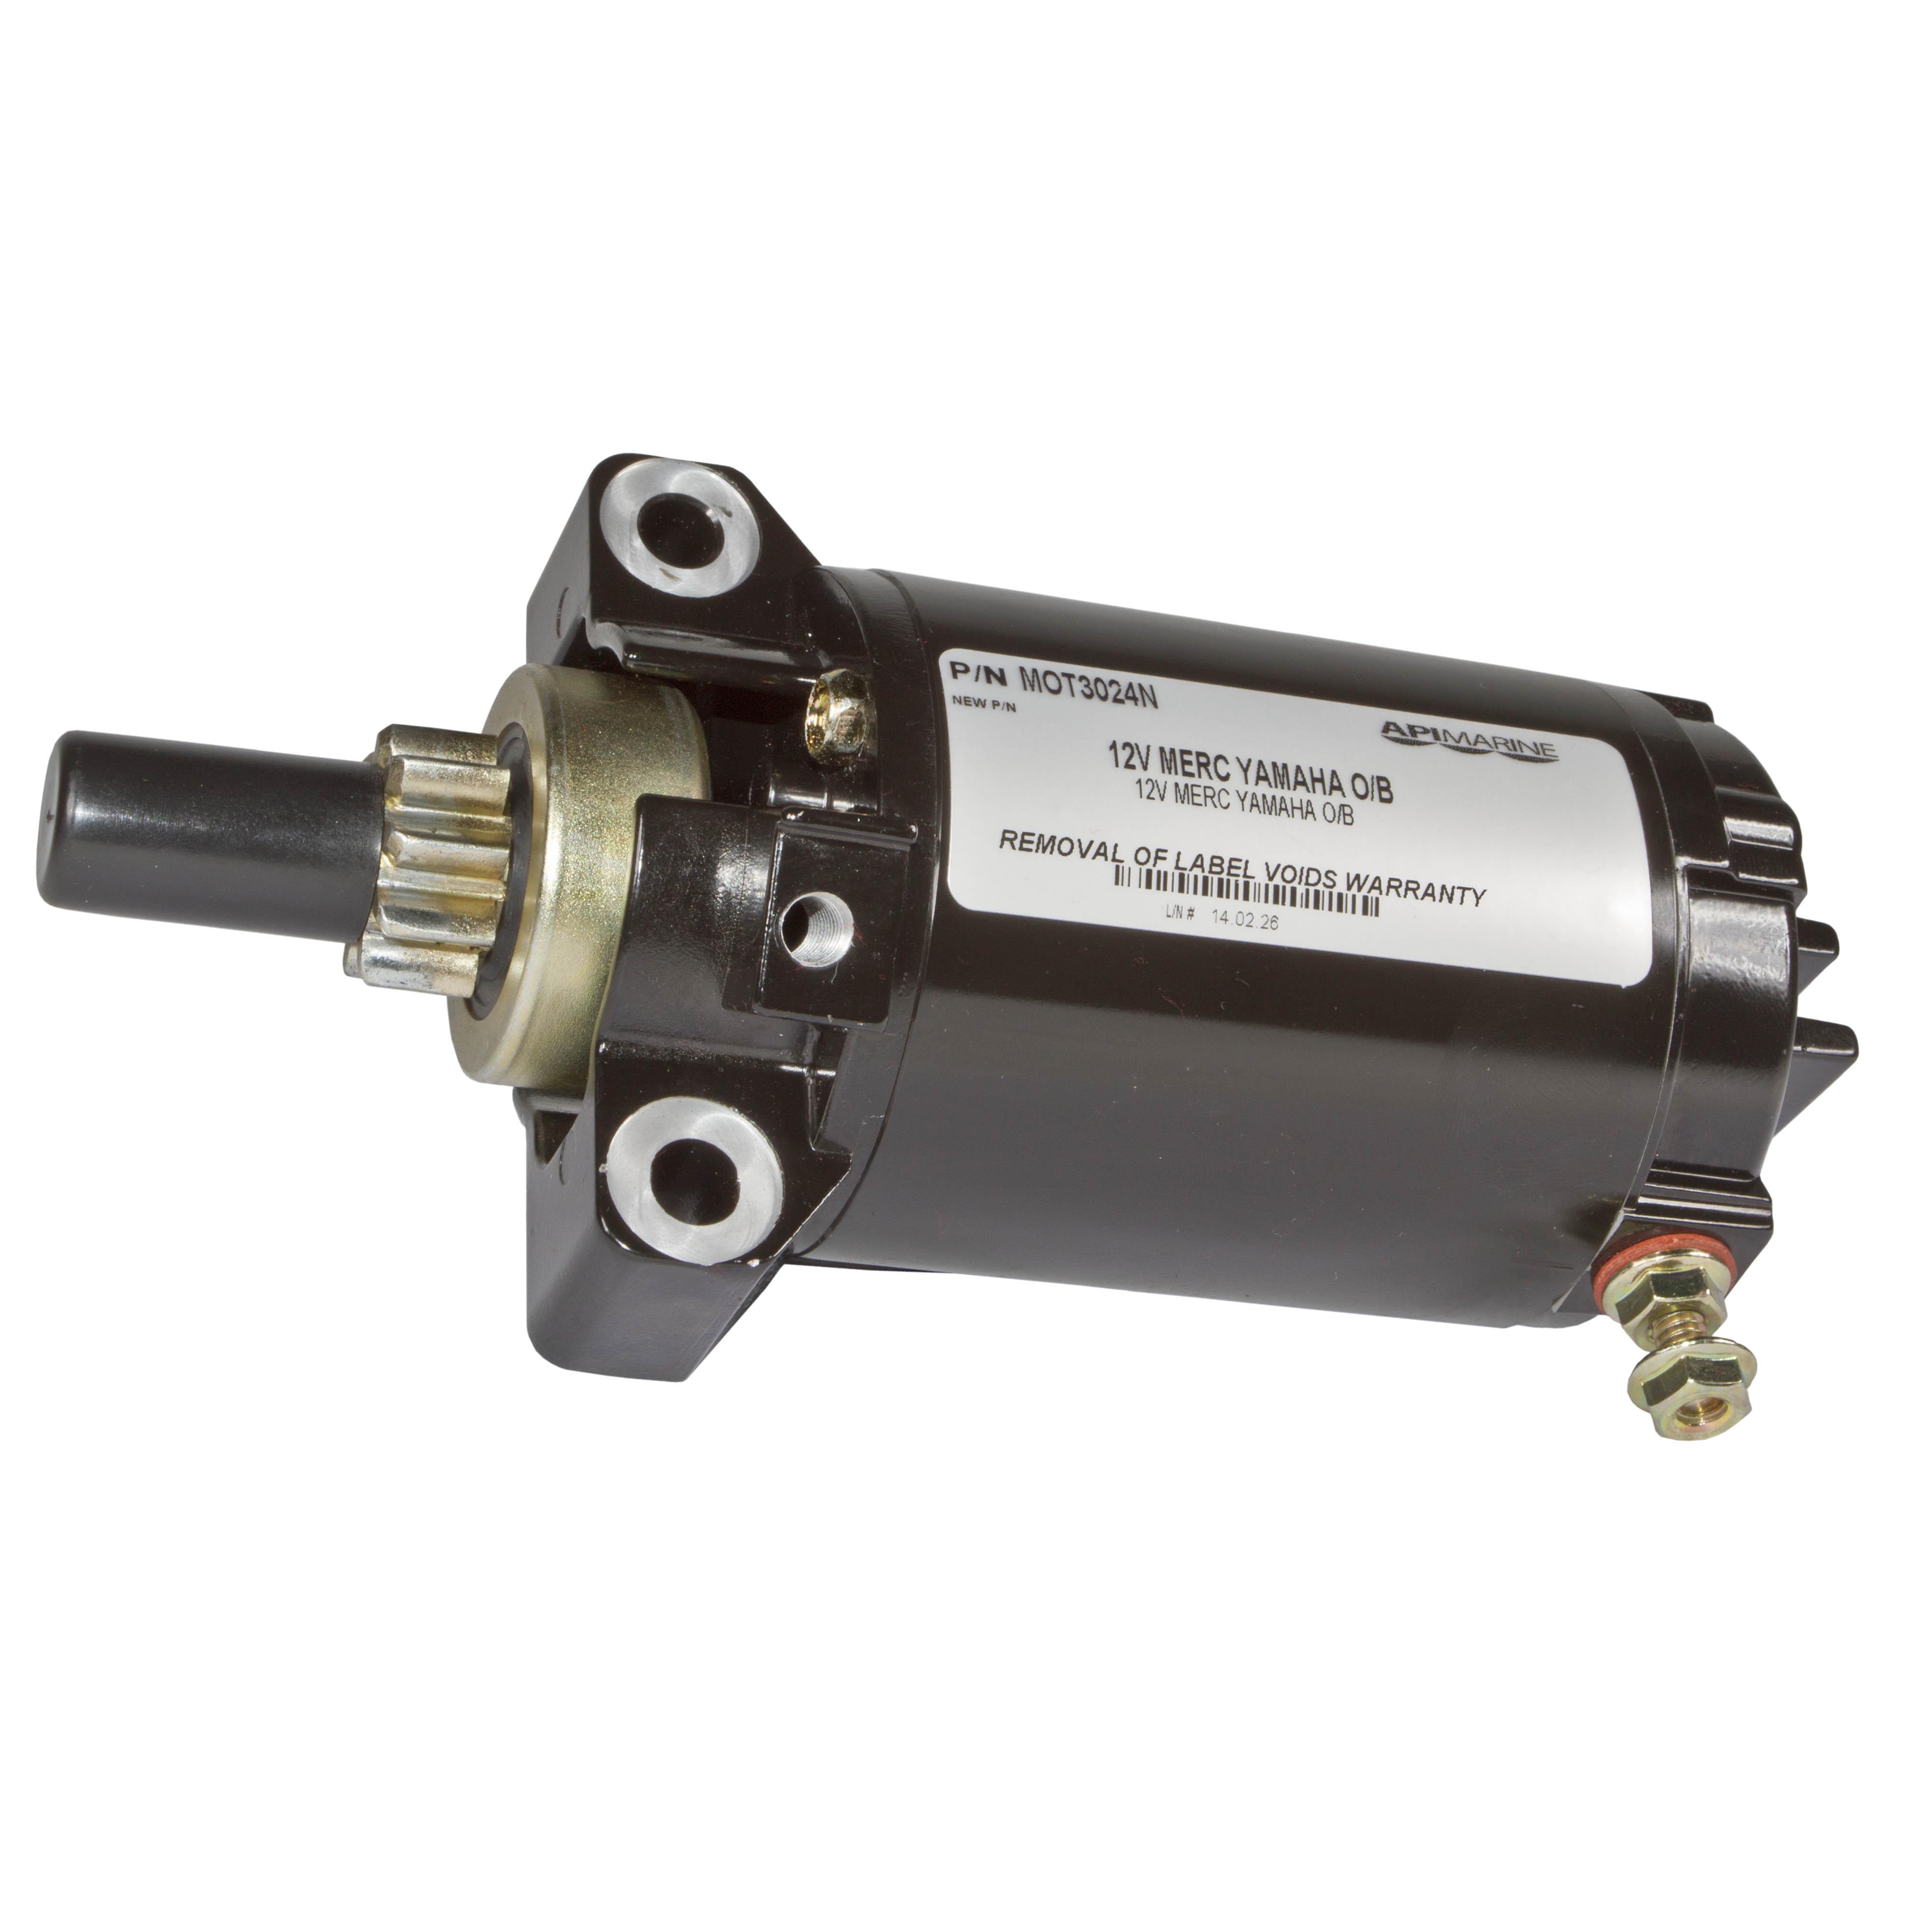 50-893894 66M-81800-02-00 Starter fits Yamaha Outboard Marine 66M-81800-01-00